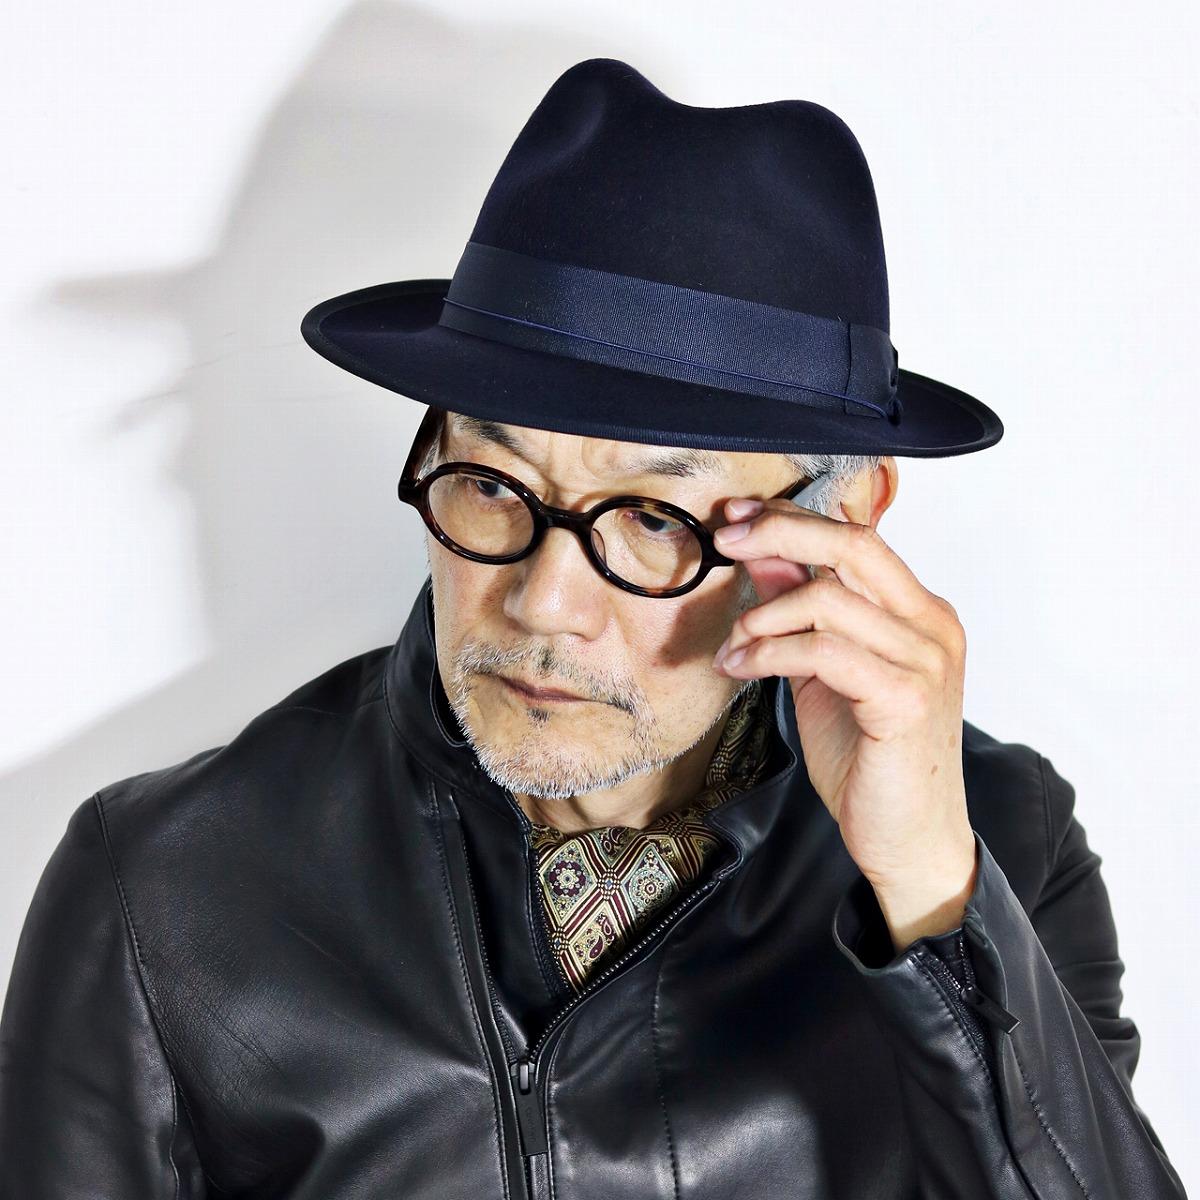 ELEHELM HAT STORE  Men s soft felt hat hat Italian brand Sorbatti crusher  bulldog Sor Bhatti hat dark blue navy in the fall and winter  dbfa21c3093